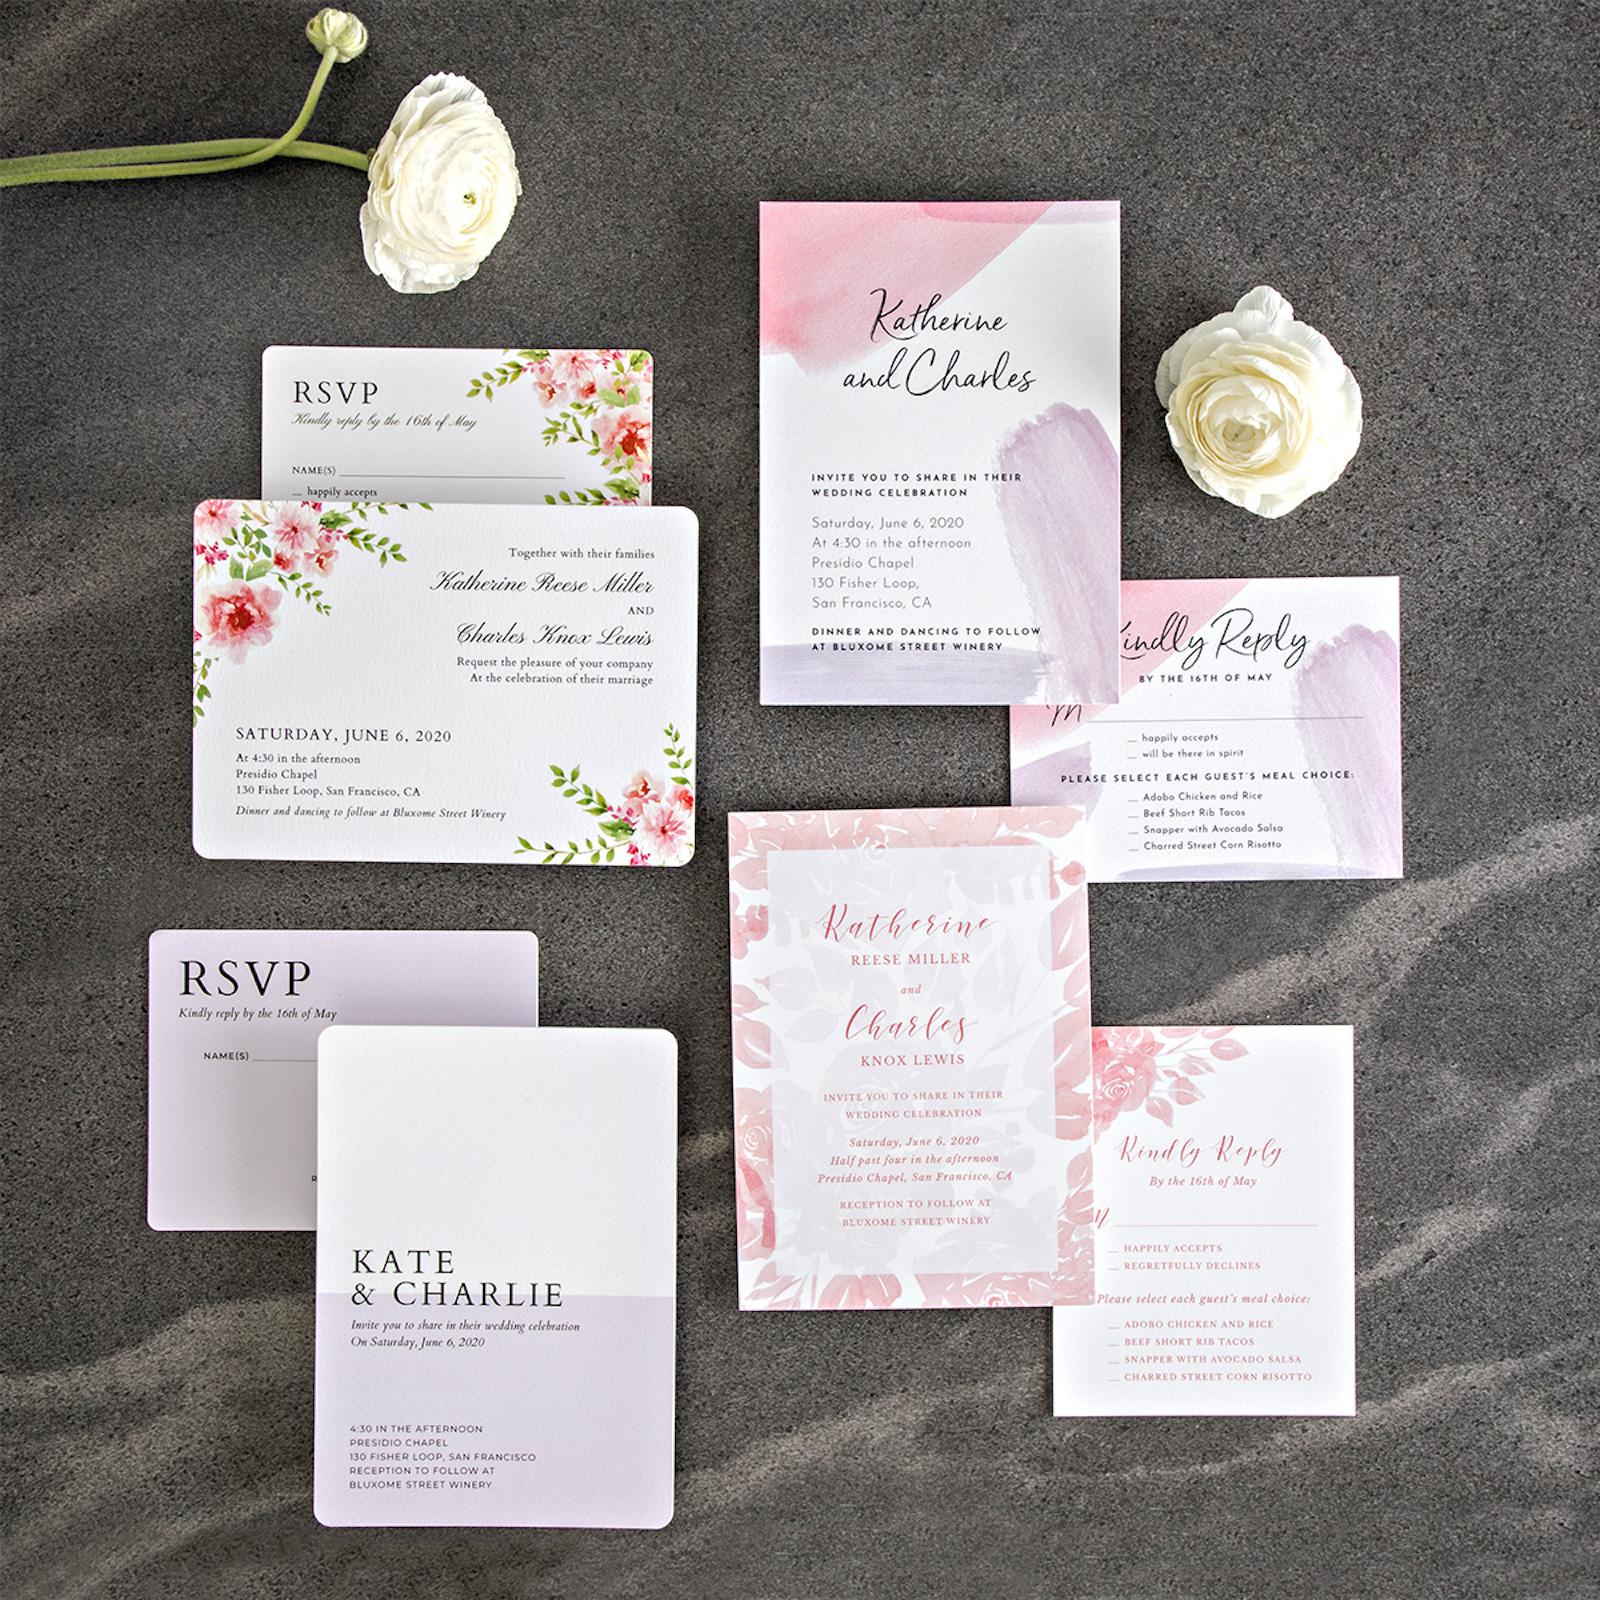 How Much Do Wedding Invitations Cost: Wedding Invitation Antique Mirror At Reisefeber.org